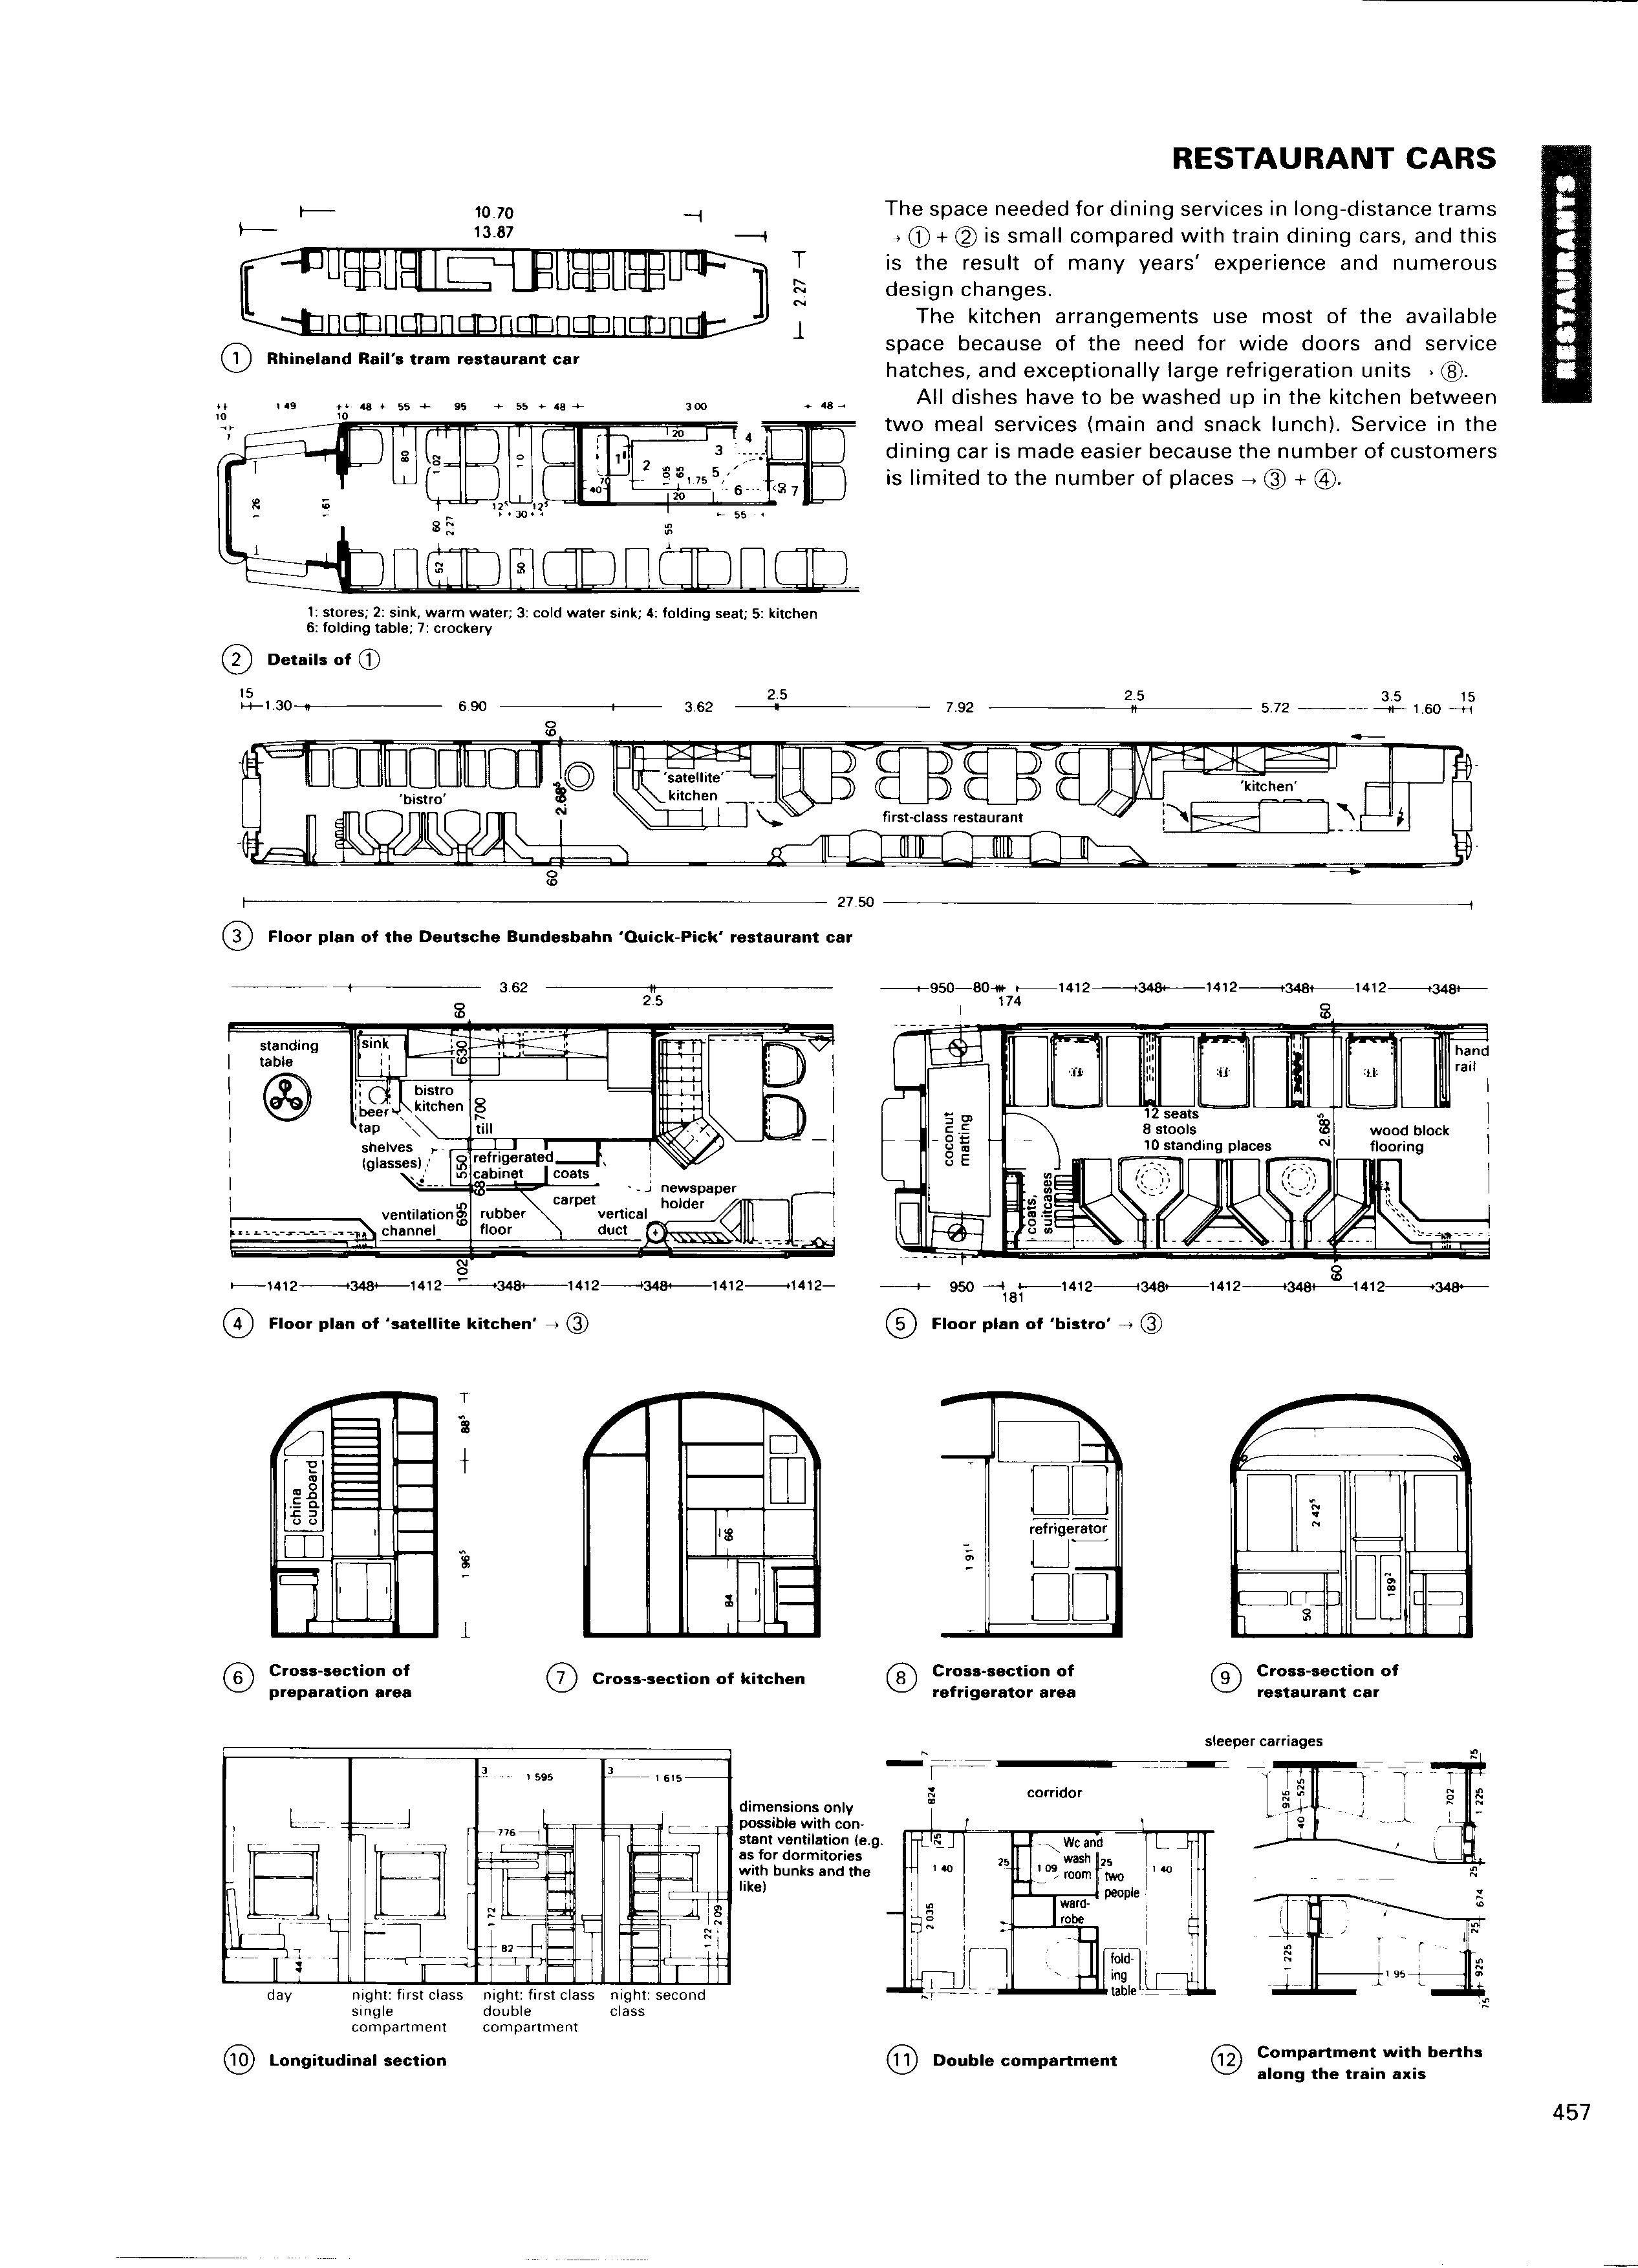 Architectural standard ernst peter neufert cafes